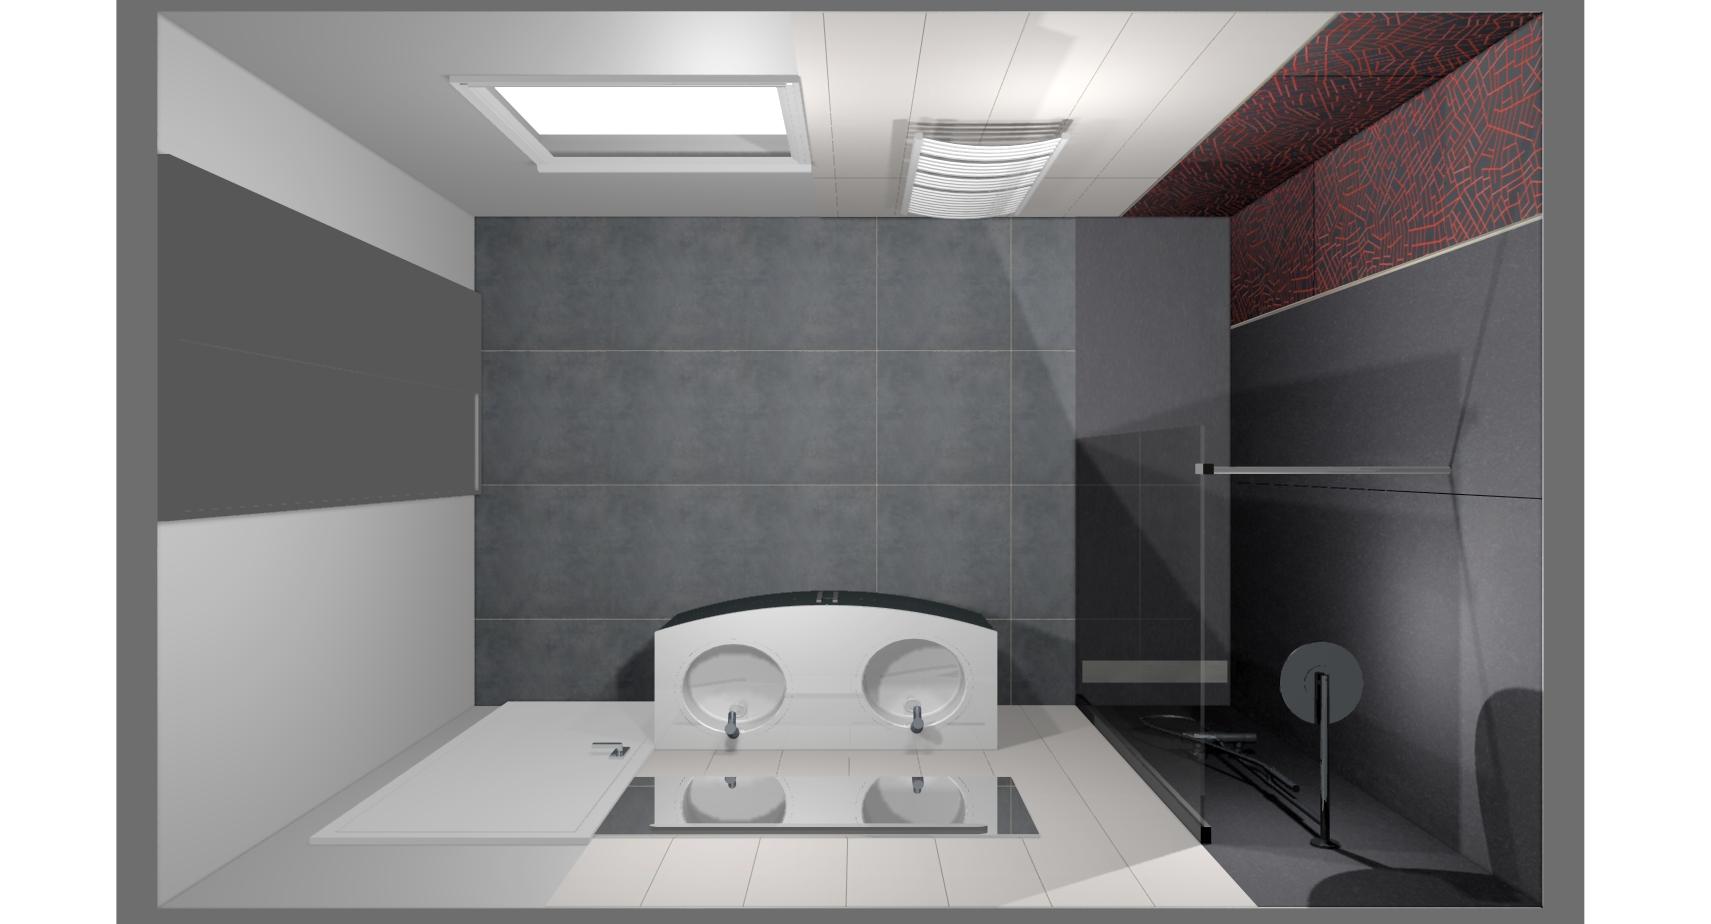 R novation compl te de salle de bain avec id 39 douch id for Plan de salle de bain 3d